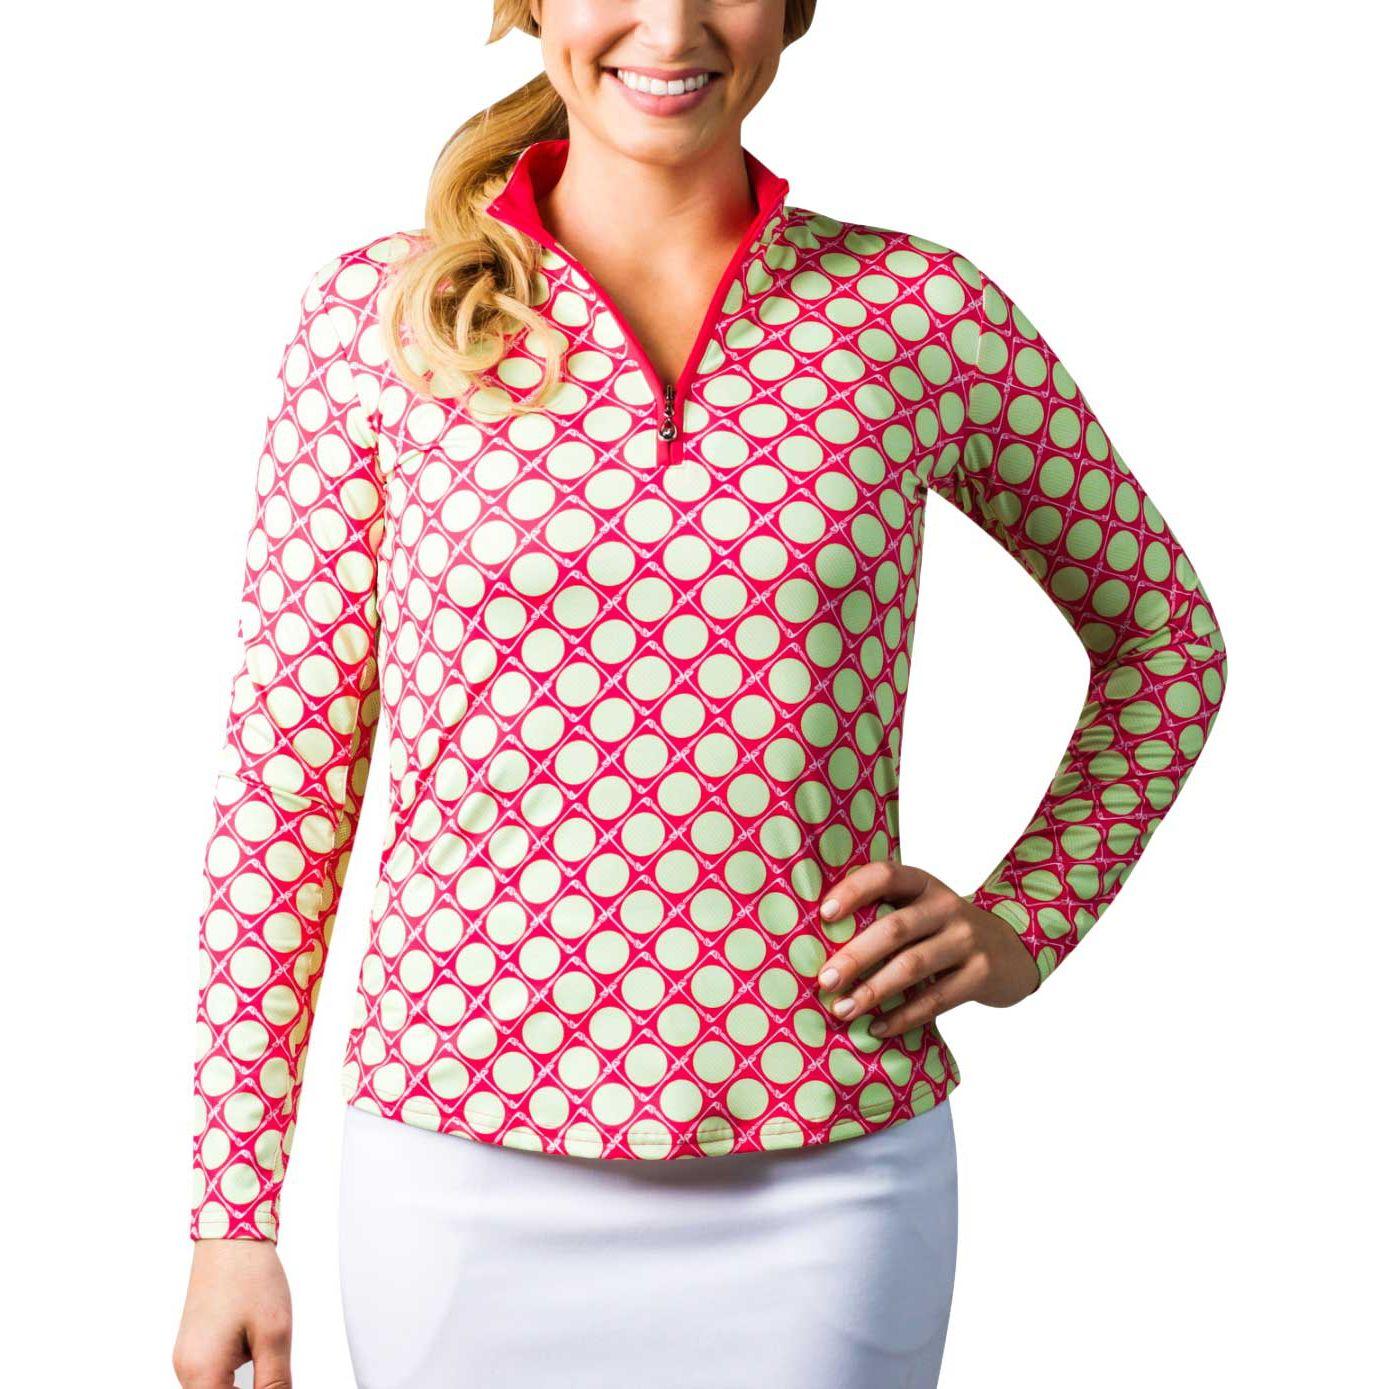 SanSoleil Women's SolCool ¼-Zip Golf Pullover